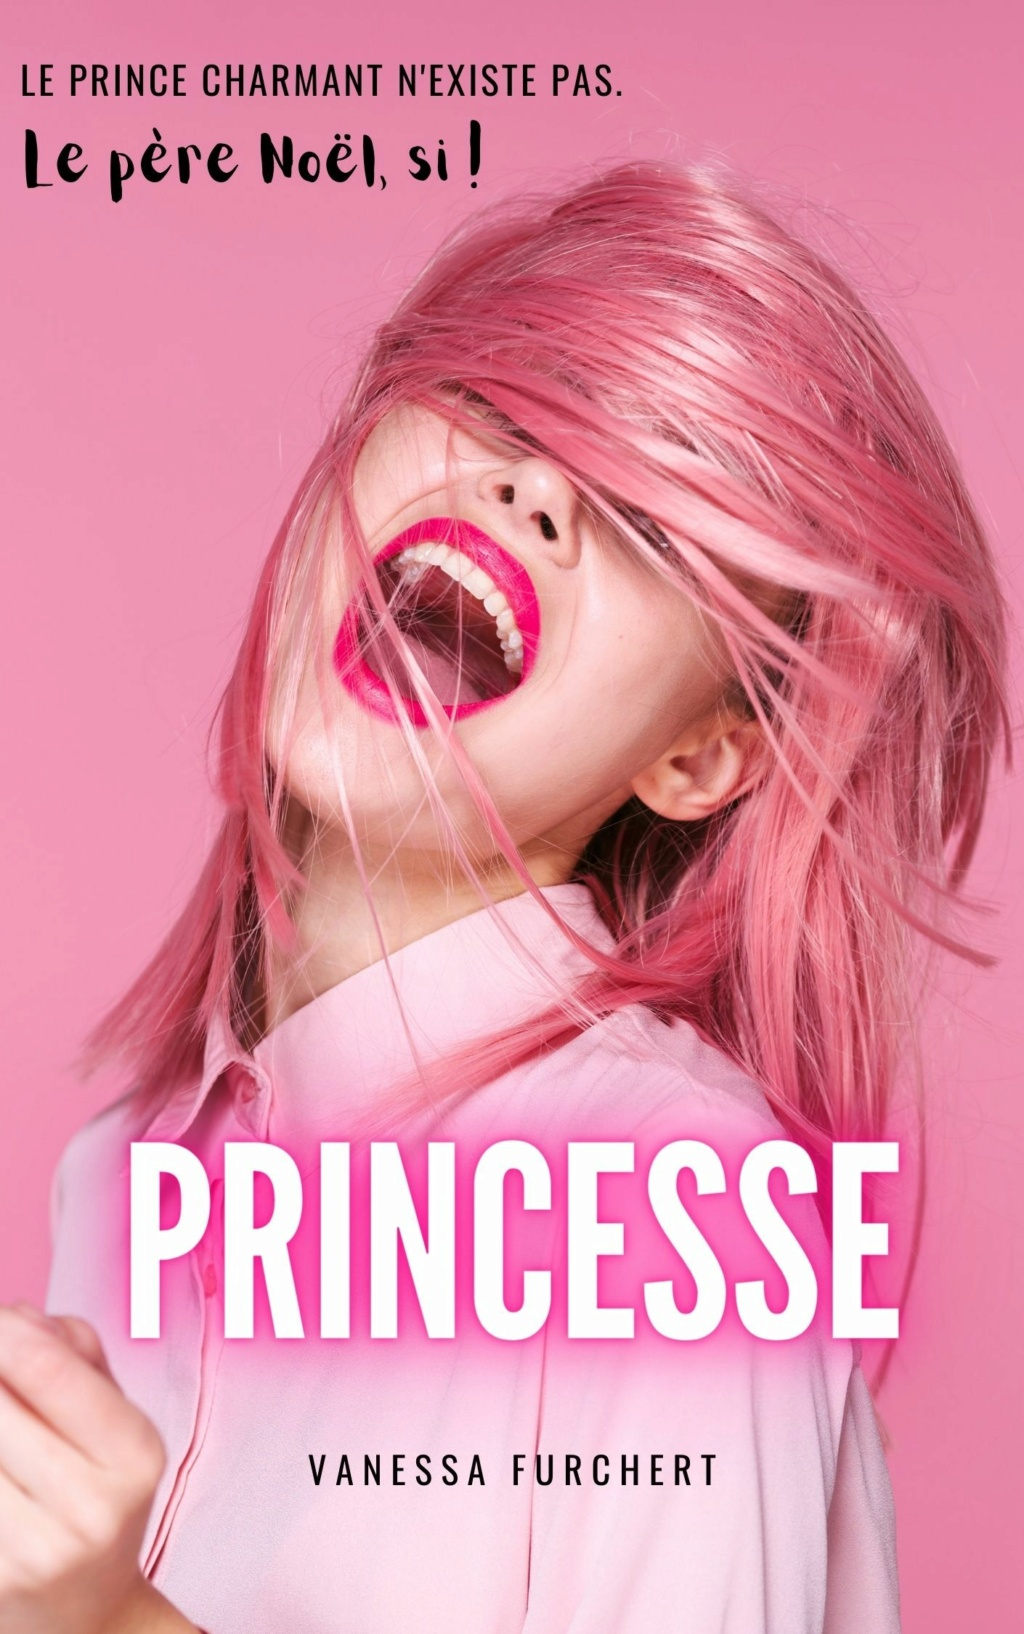 Princesse de Vanessa Furchert Prince10